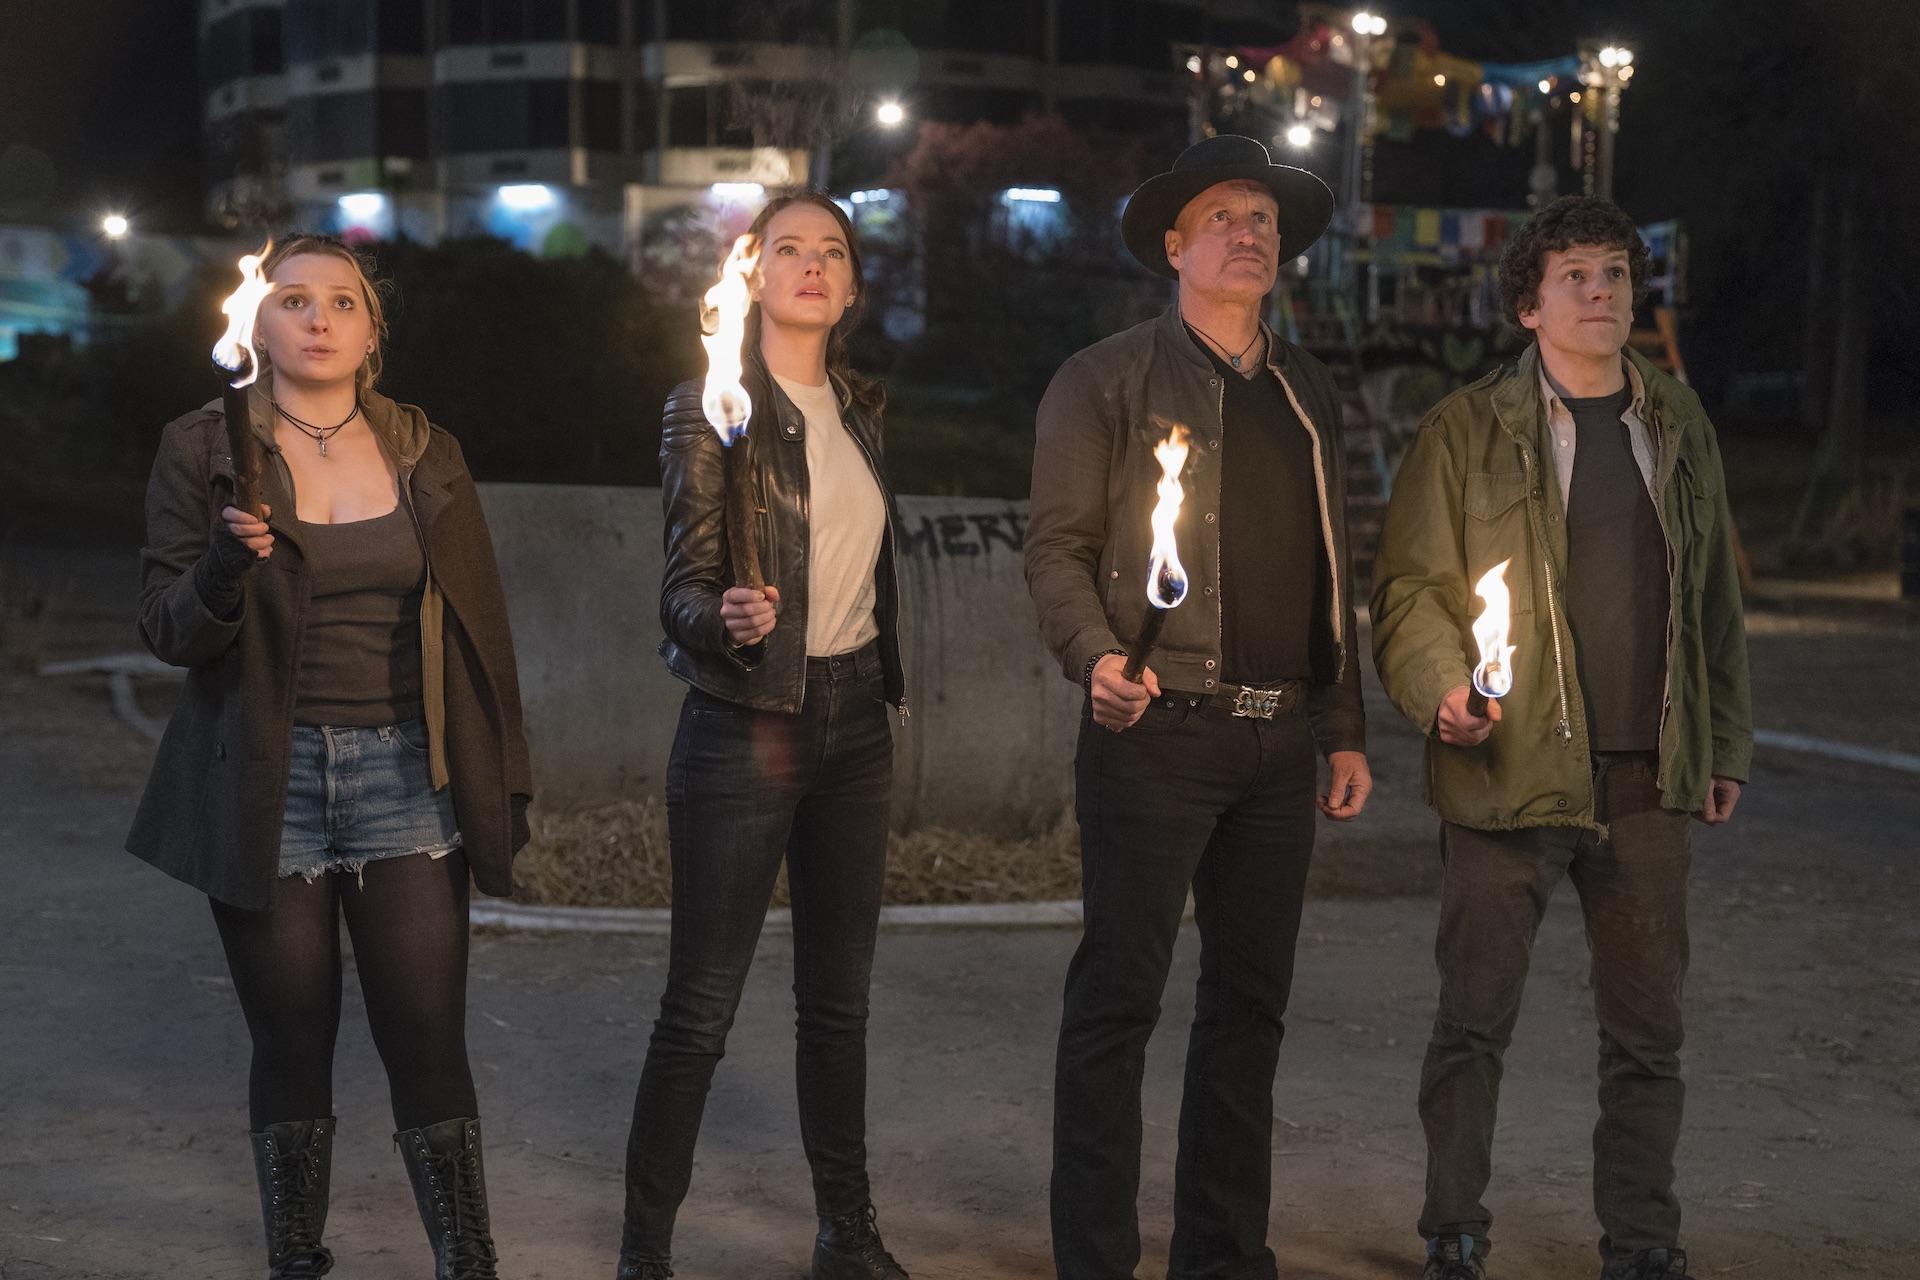 Little Rock (Abigail Breslin), Wichita (Emma Stone), Tallahassee (Woody Harrelson), and Columbus (Jesse Eisenberg) all bear torches.